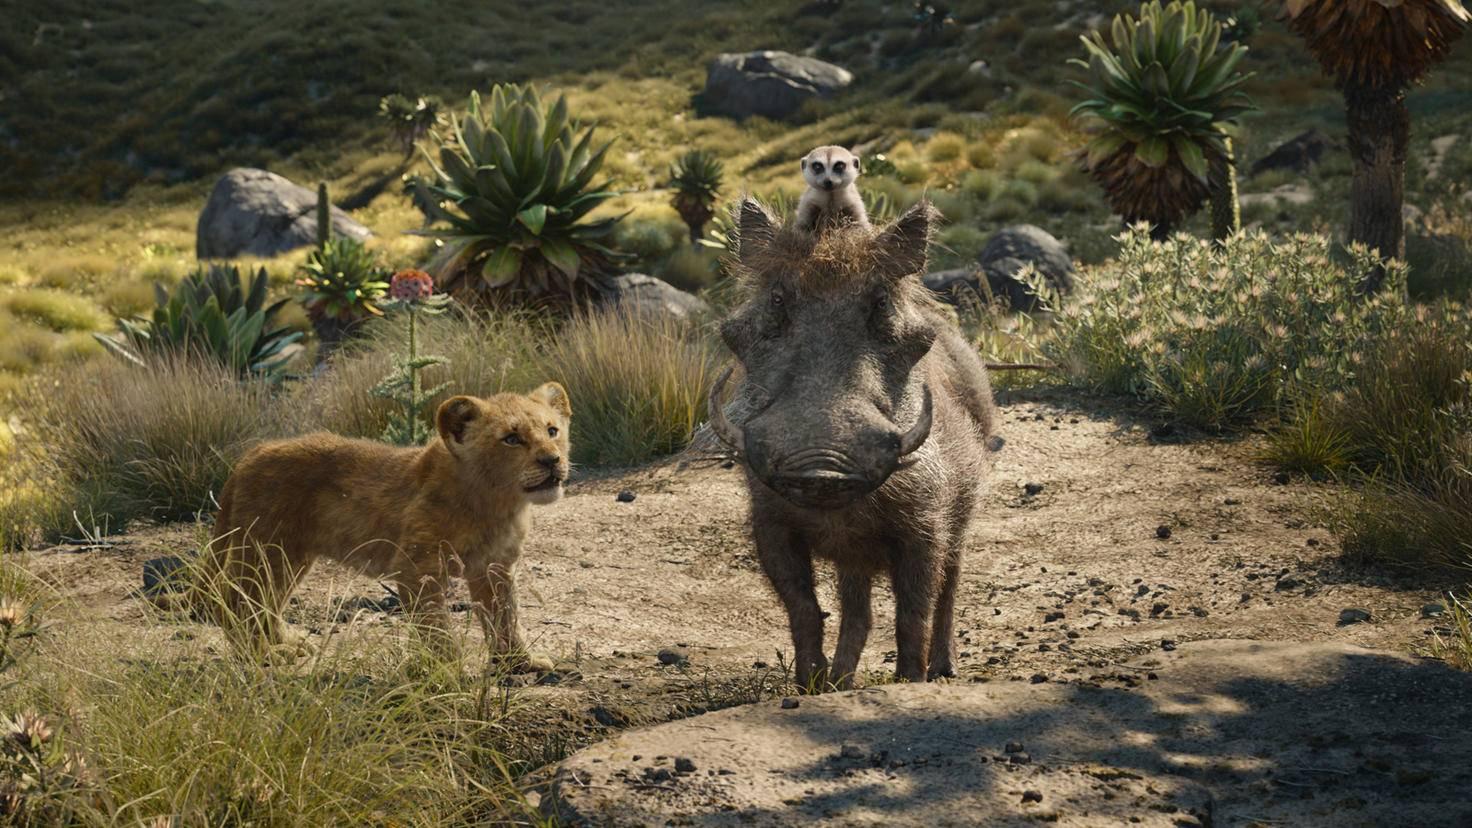 The secret stars: Timon and Pumbaa.